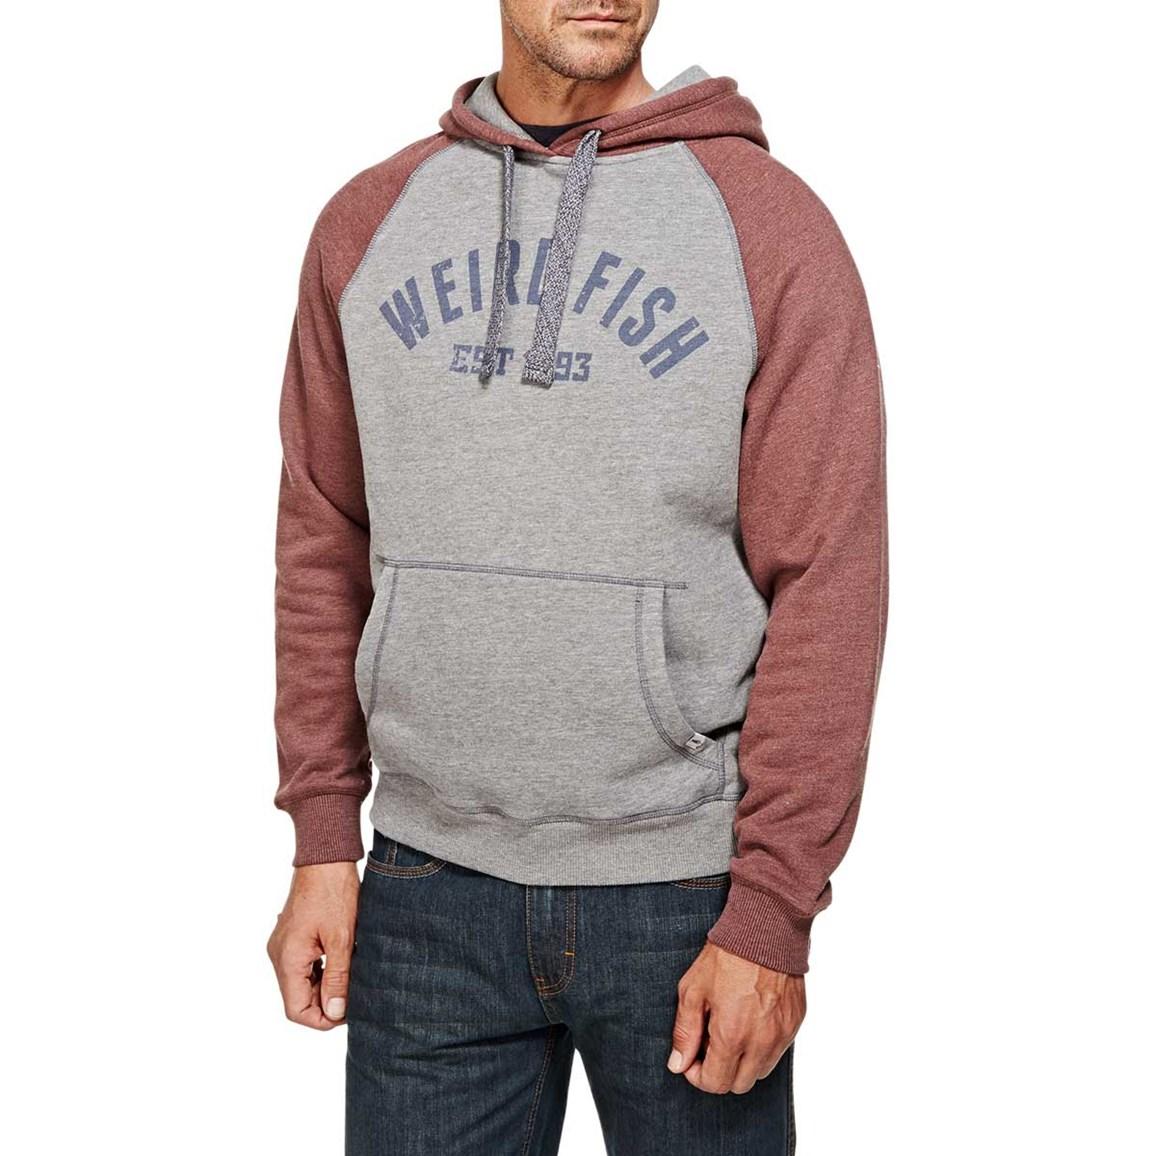 Norie Branded Graphic Print Hooded Sweatshirt Conker